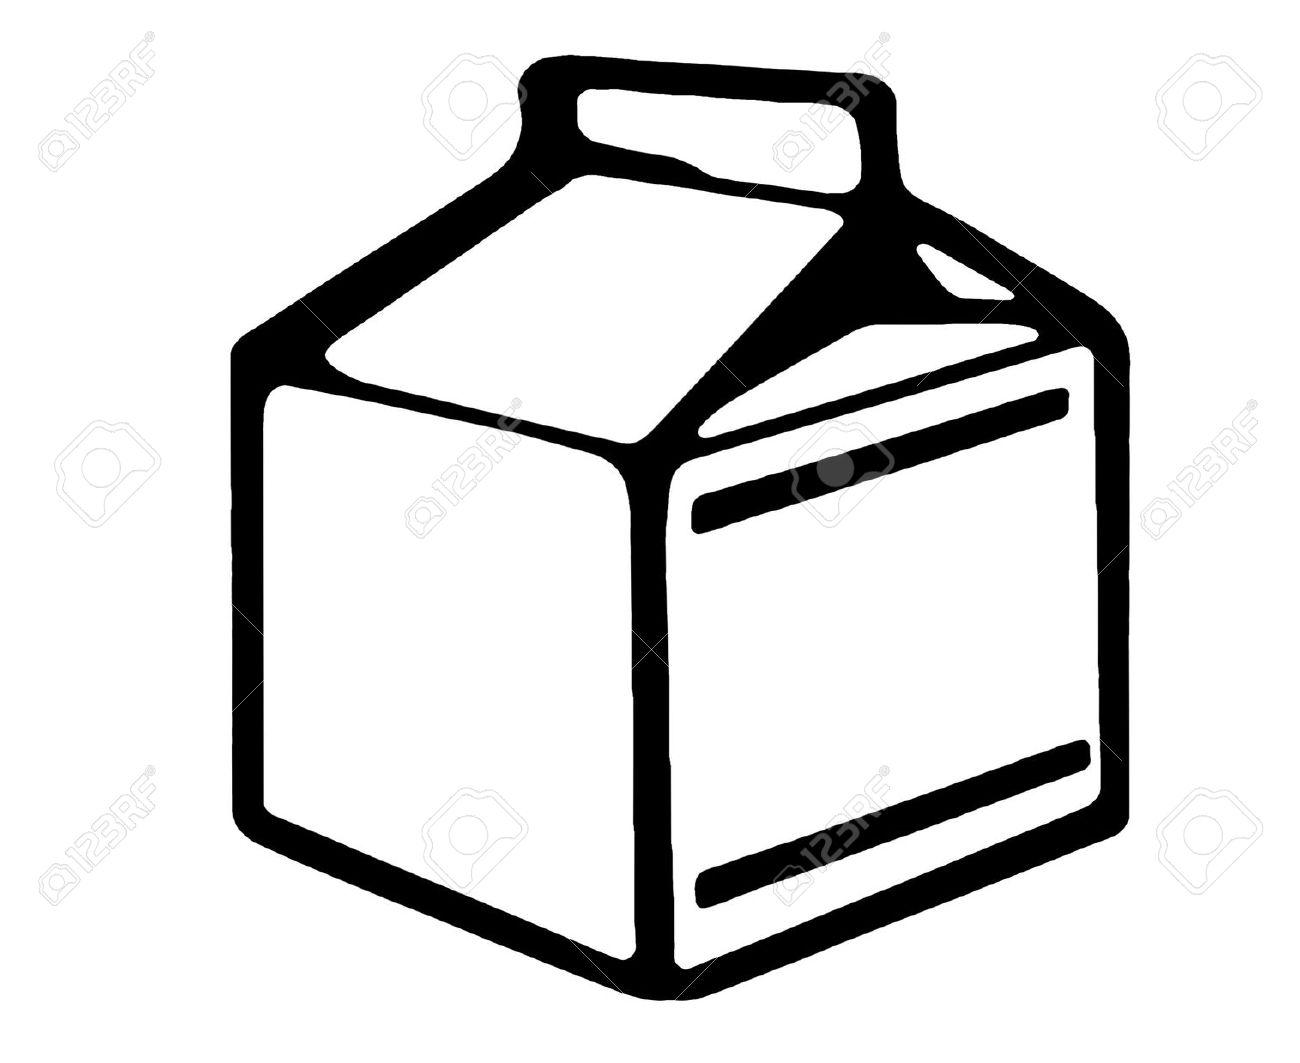 Clipart milk quart milk. Carton free download best